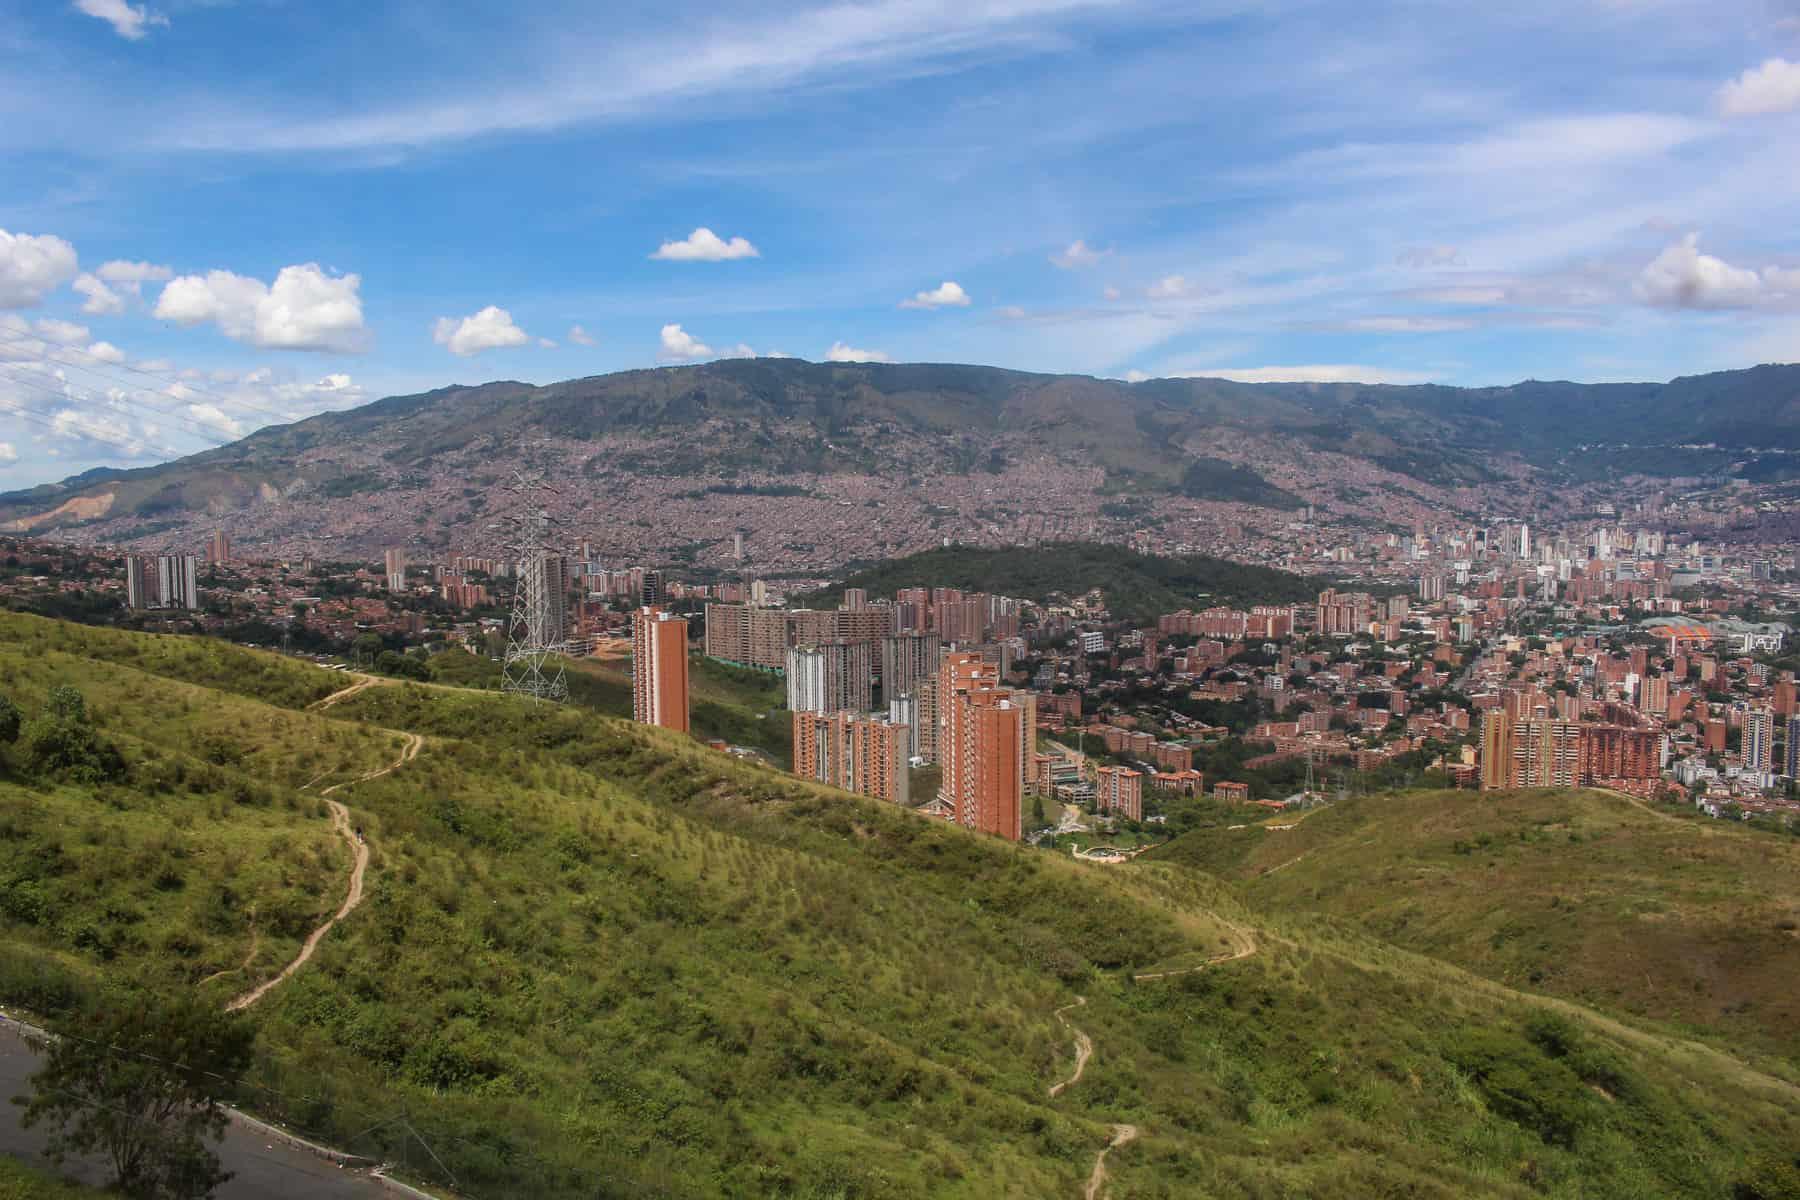 Views of Medellin